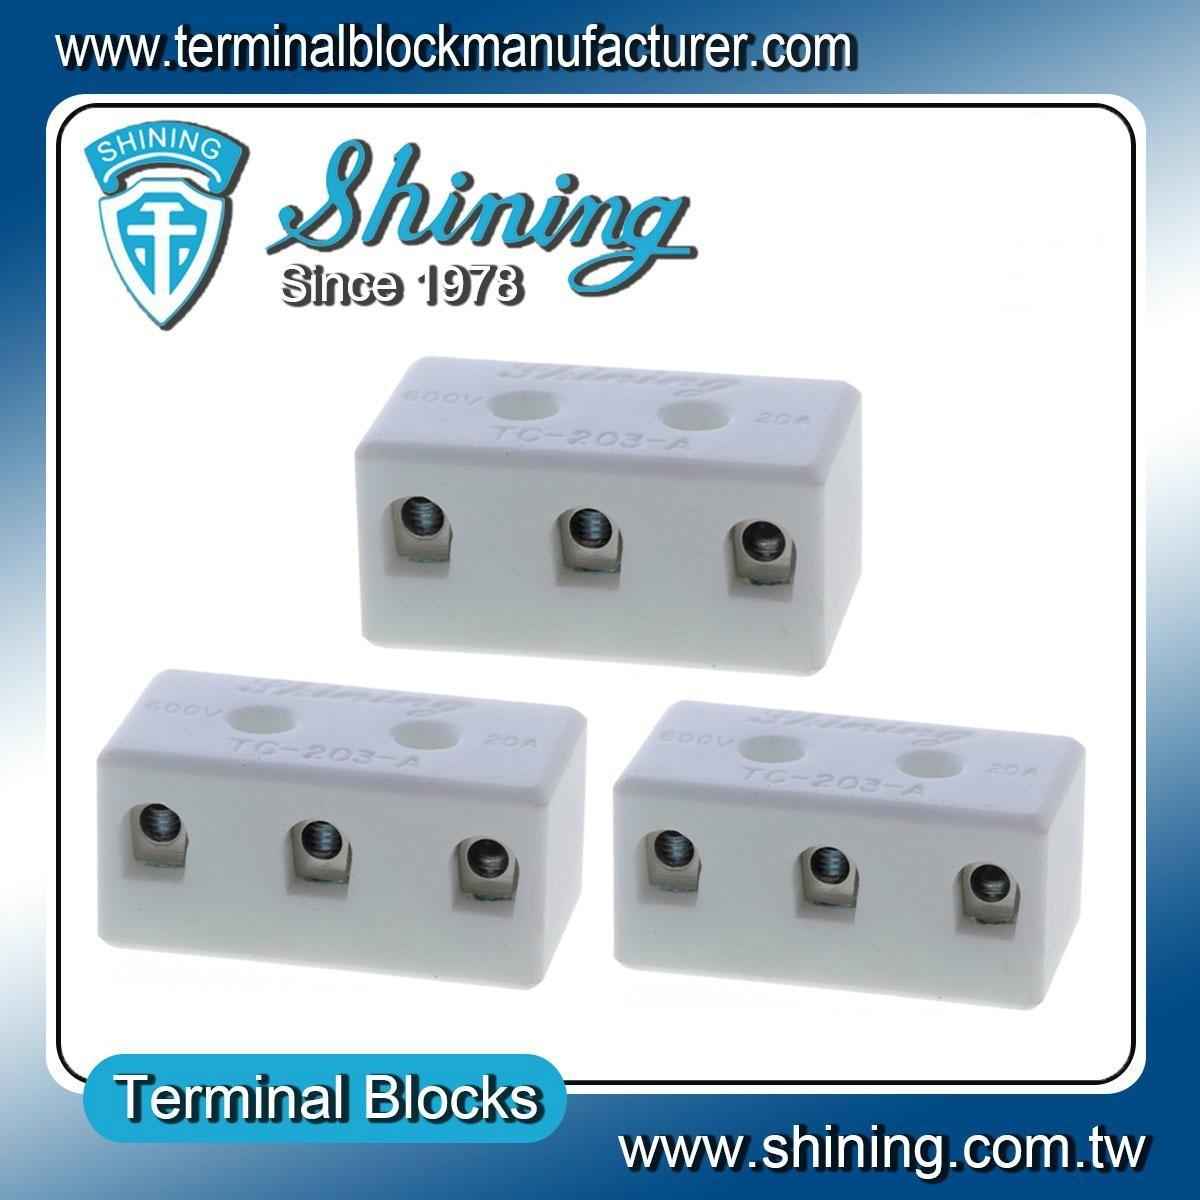 TC-203-A 陶瓷端子台 Ceramic Terminal Block 5